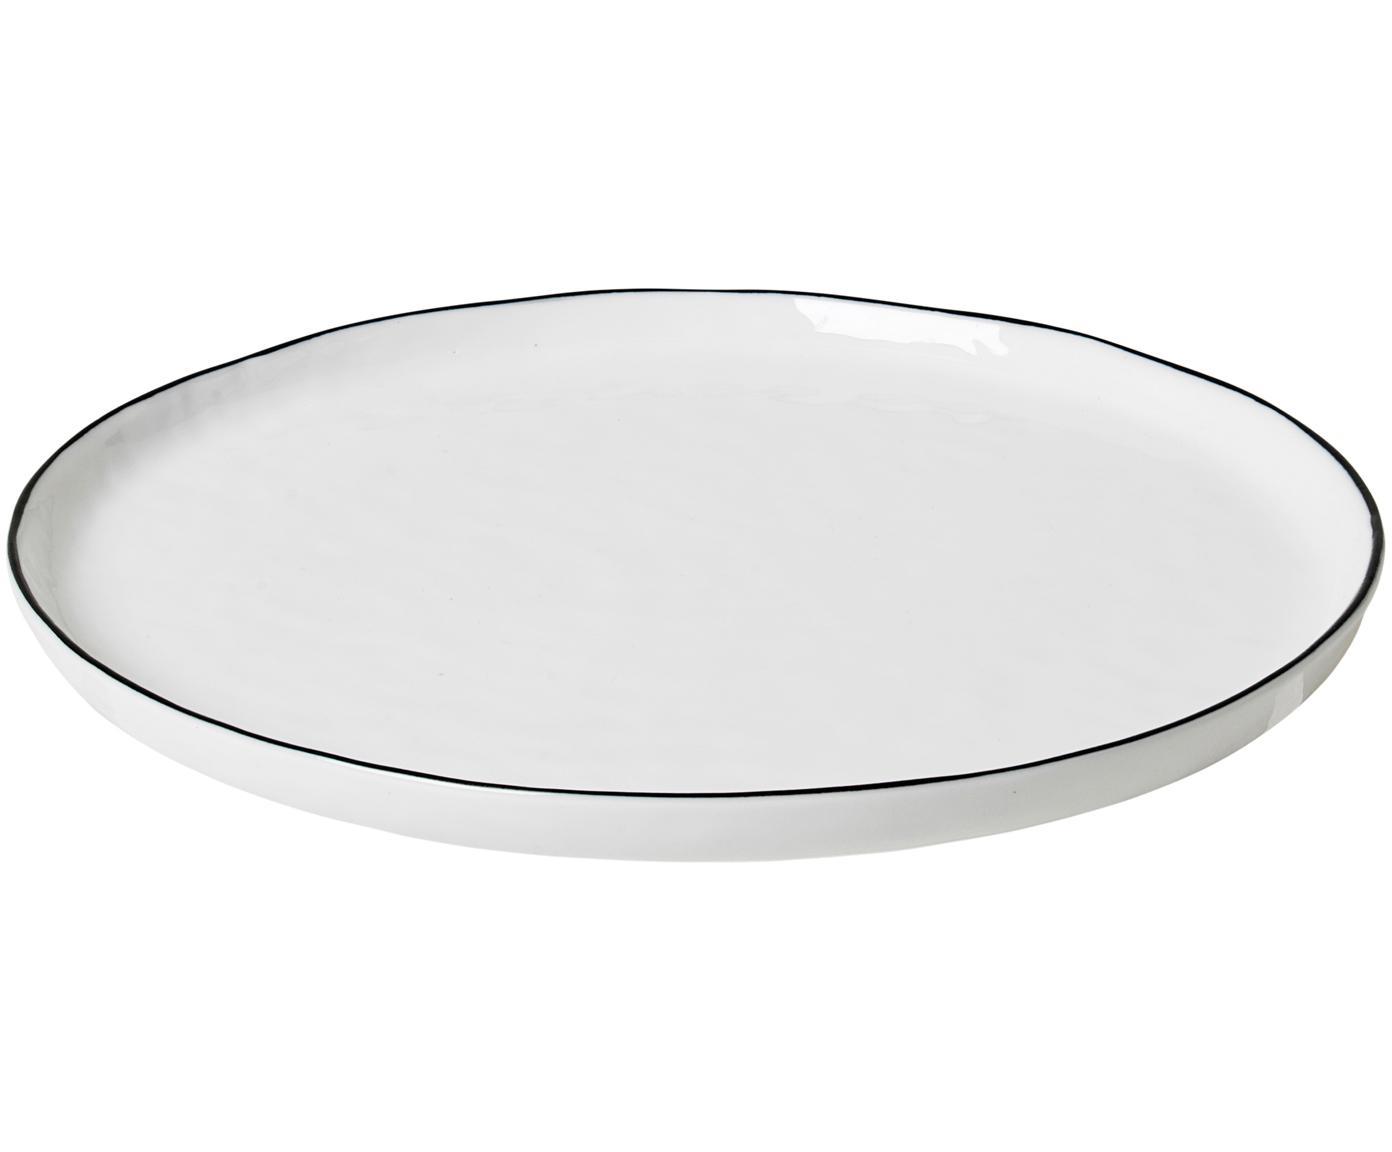 Handgemachte Frühstücksteller Salt, 4 Stück, Porzellan, Gebrochenes Weiss, Schwarz, Ø 22 cm